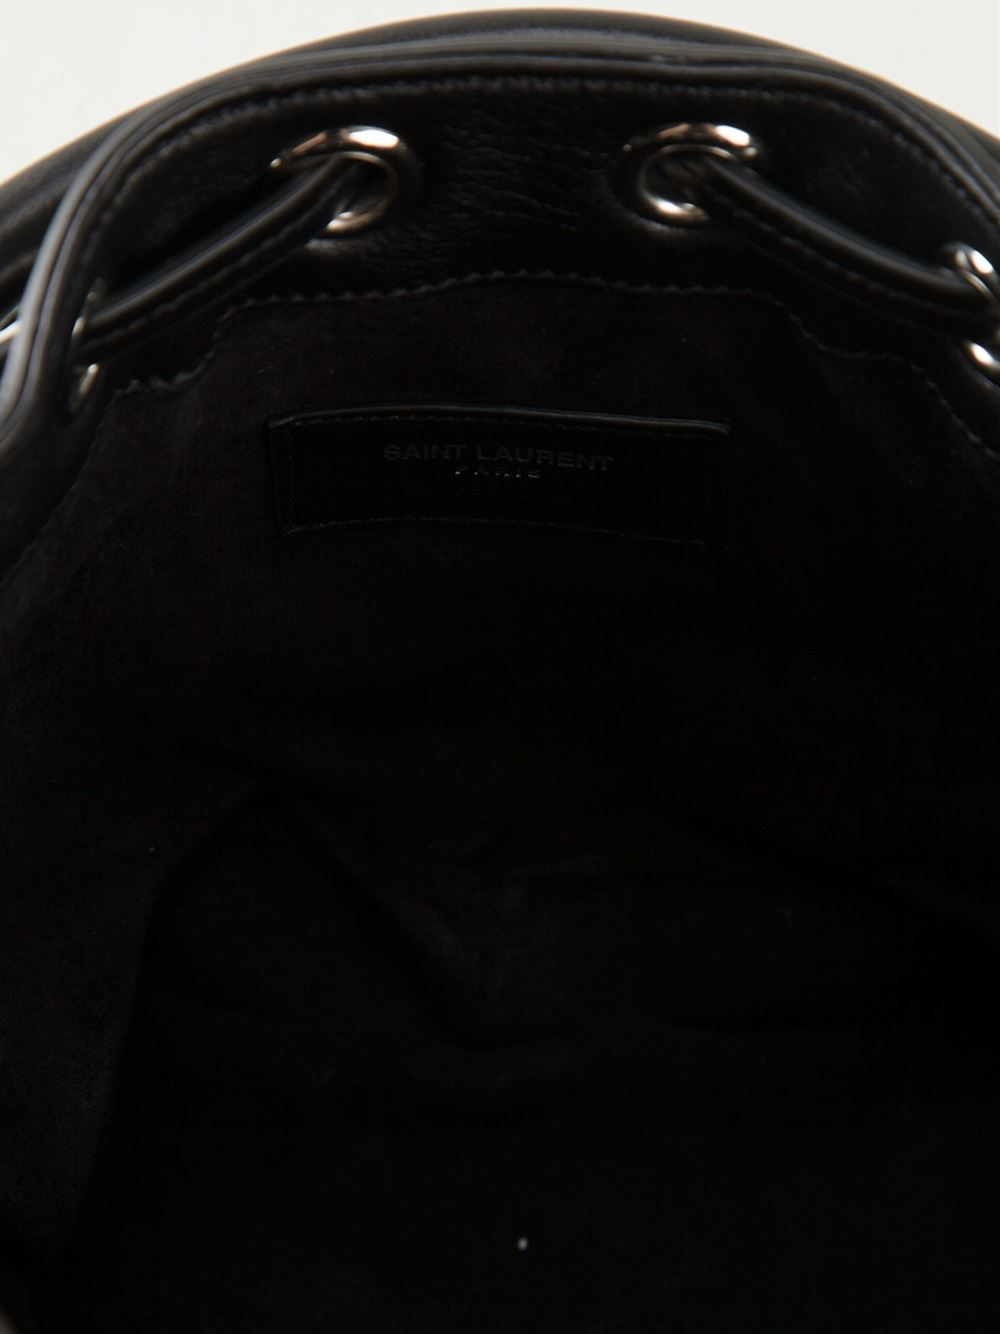 Lyst Saint Laurent Emmanuelle Bucket Bag In Black